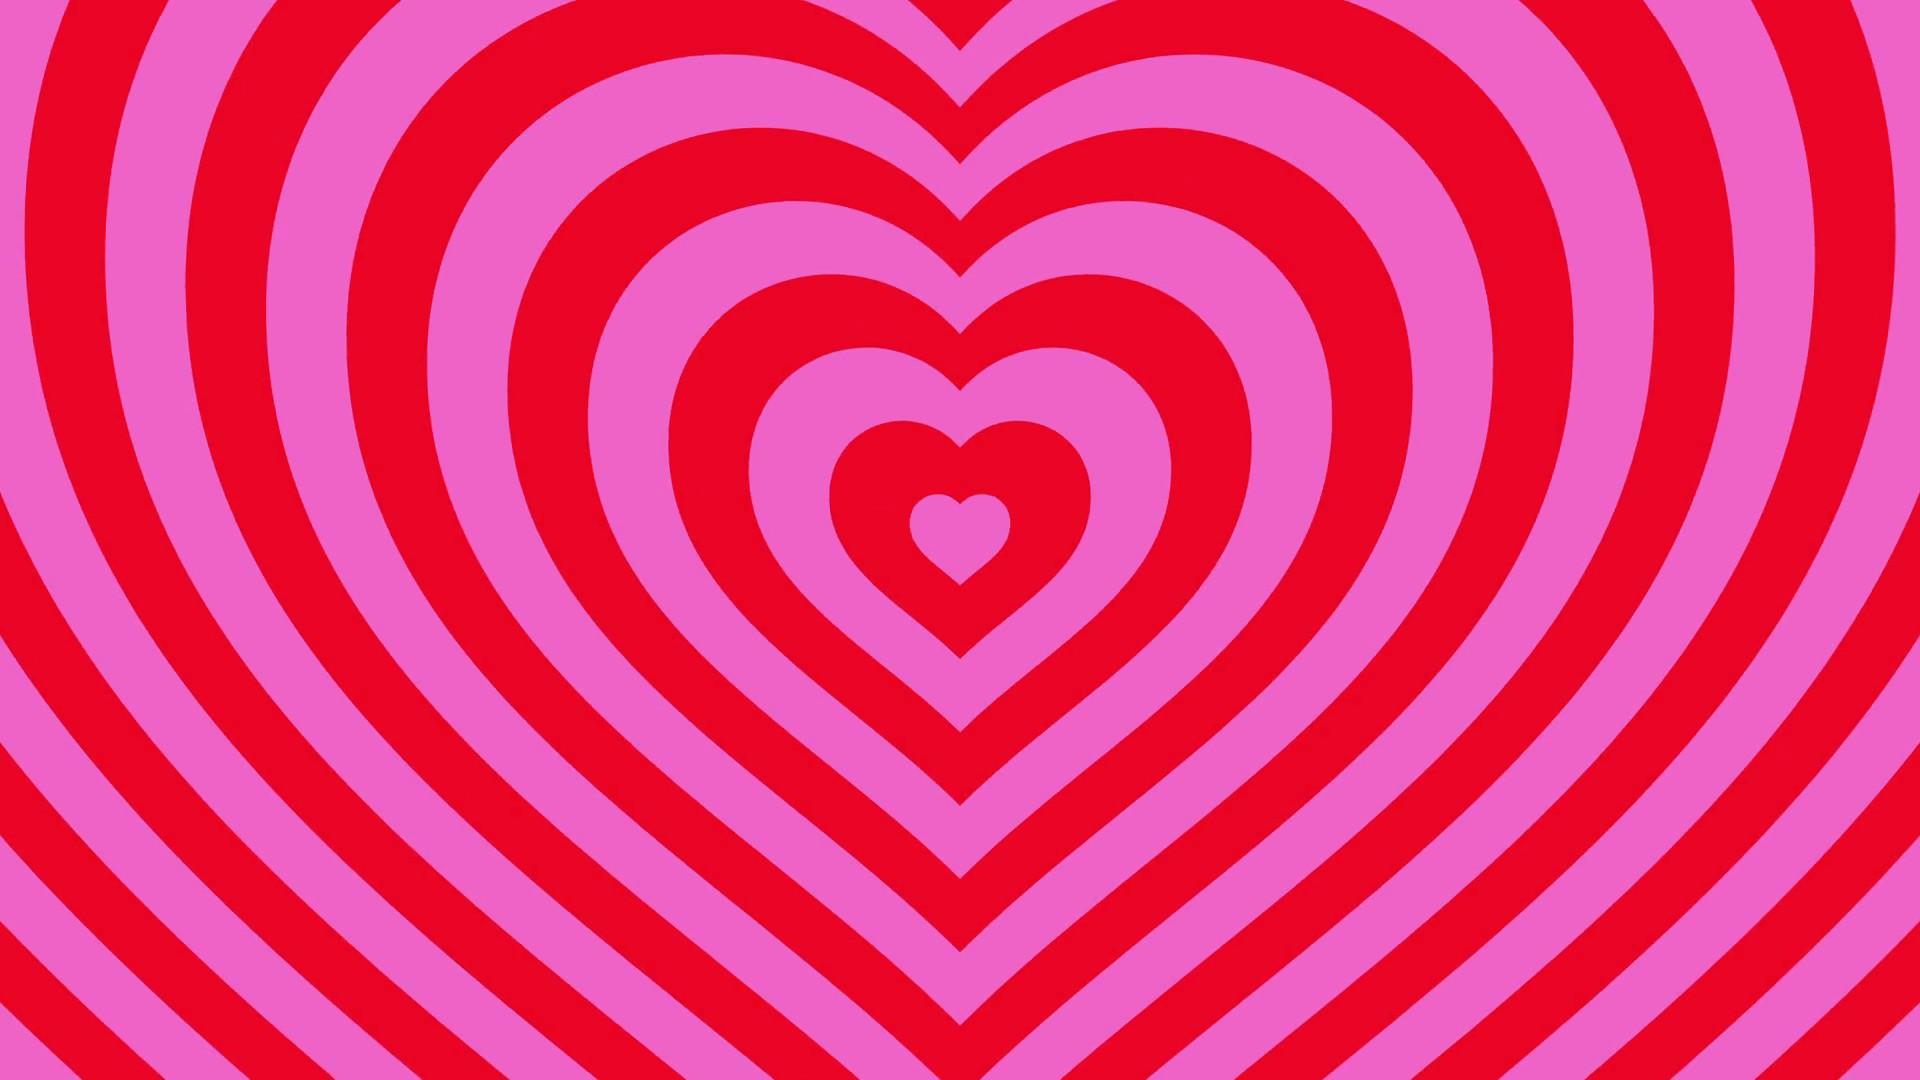 Love Heart Wallpaper Hd Wallpapertag: Love Hearts Background ·① WallpaperTag